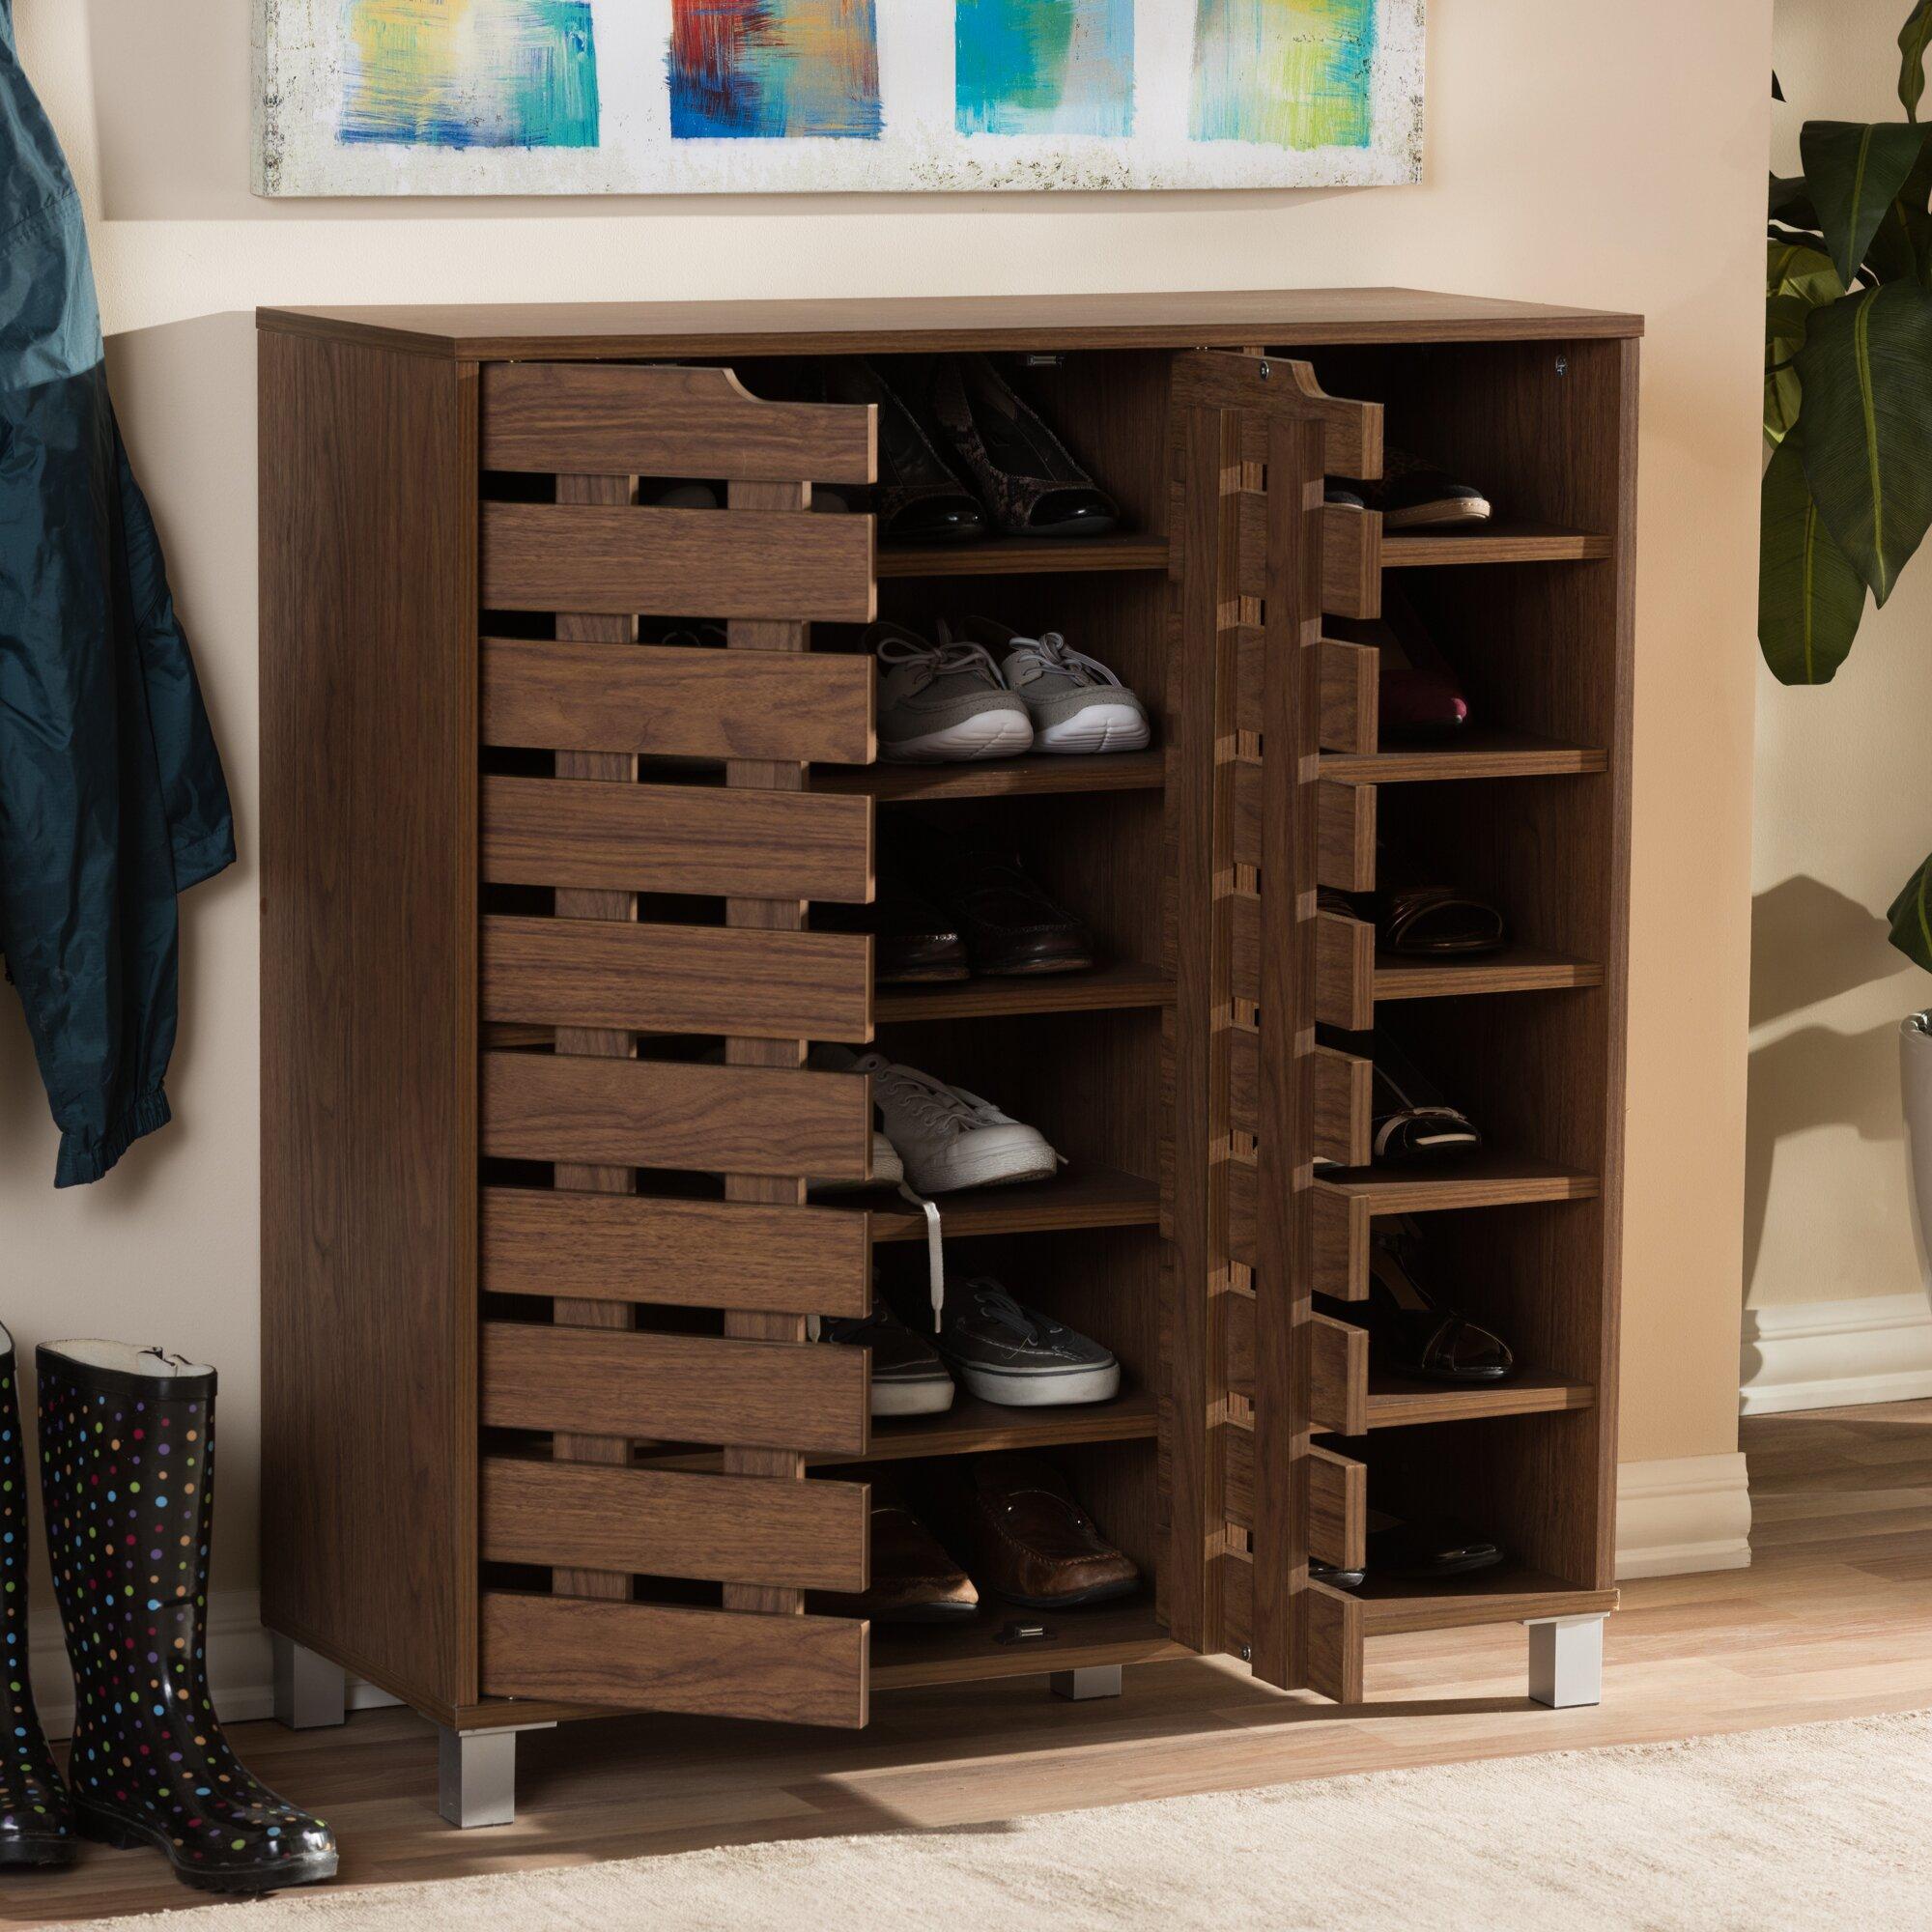 wholesale interiors baxton studio beppe 18 pair shoe storage